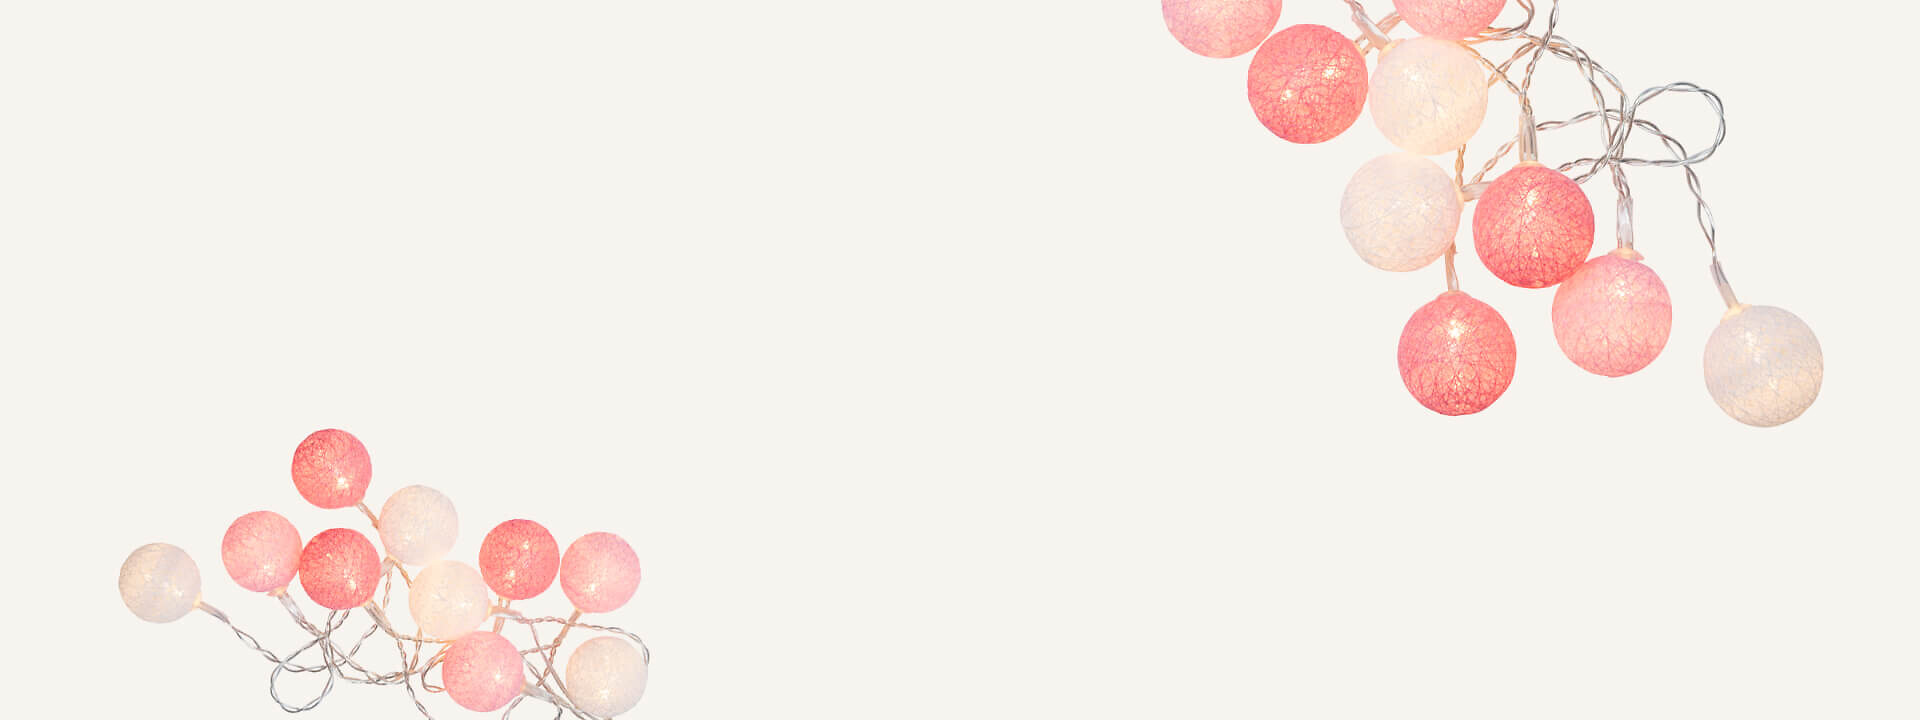 Roosa nauha -koristevalot